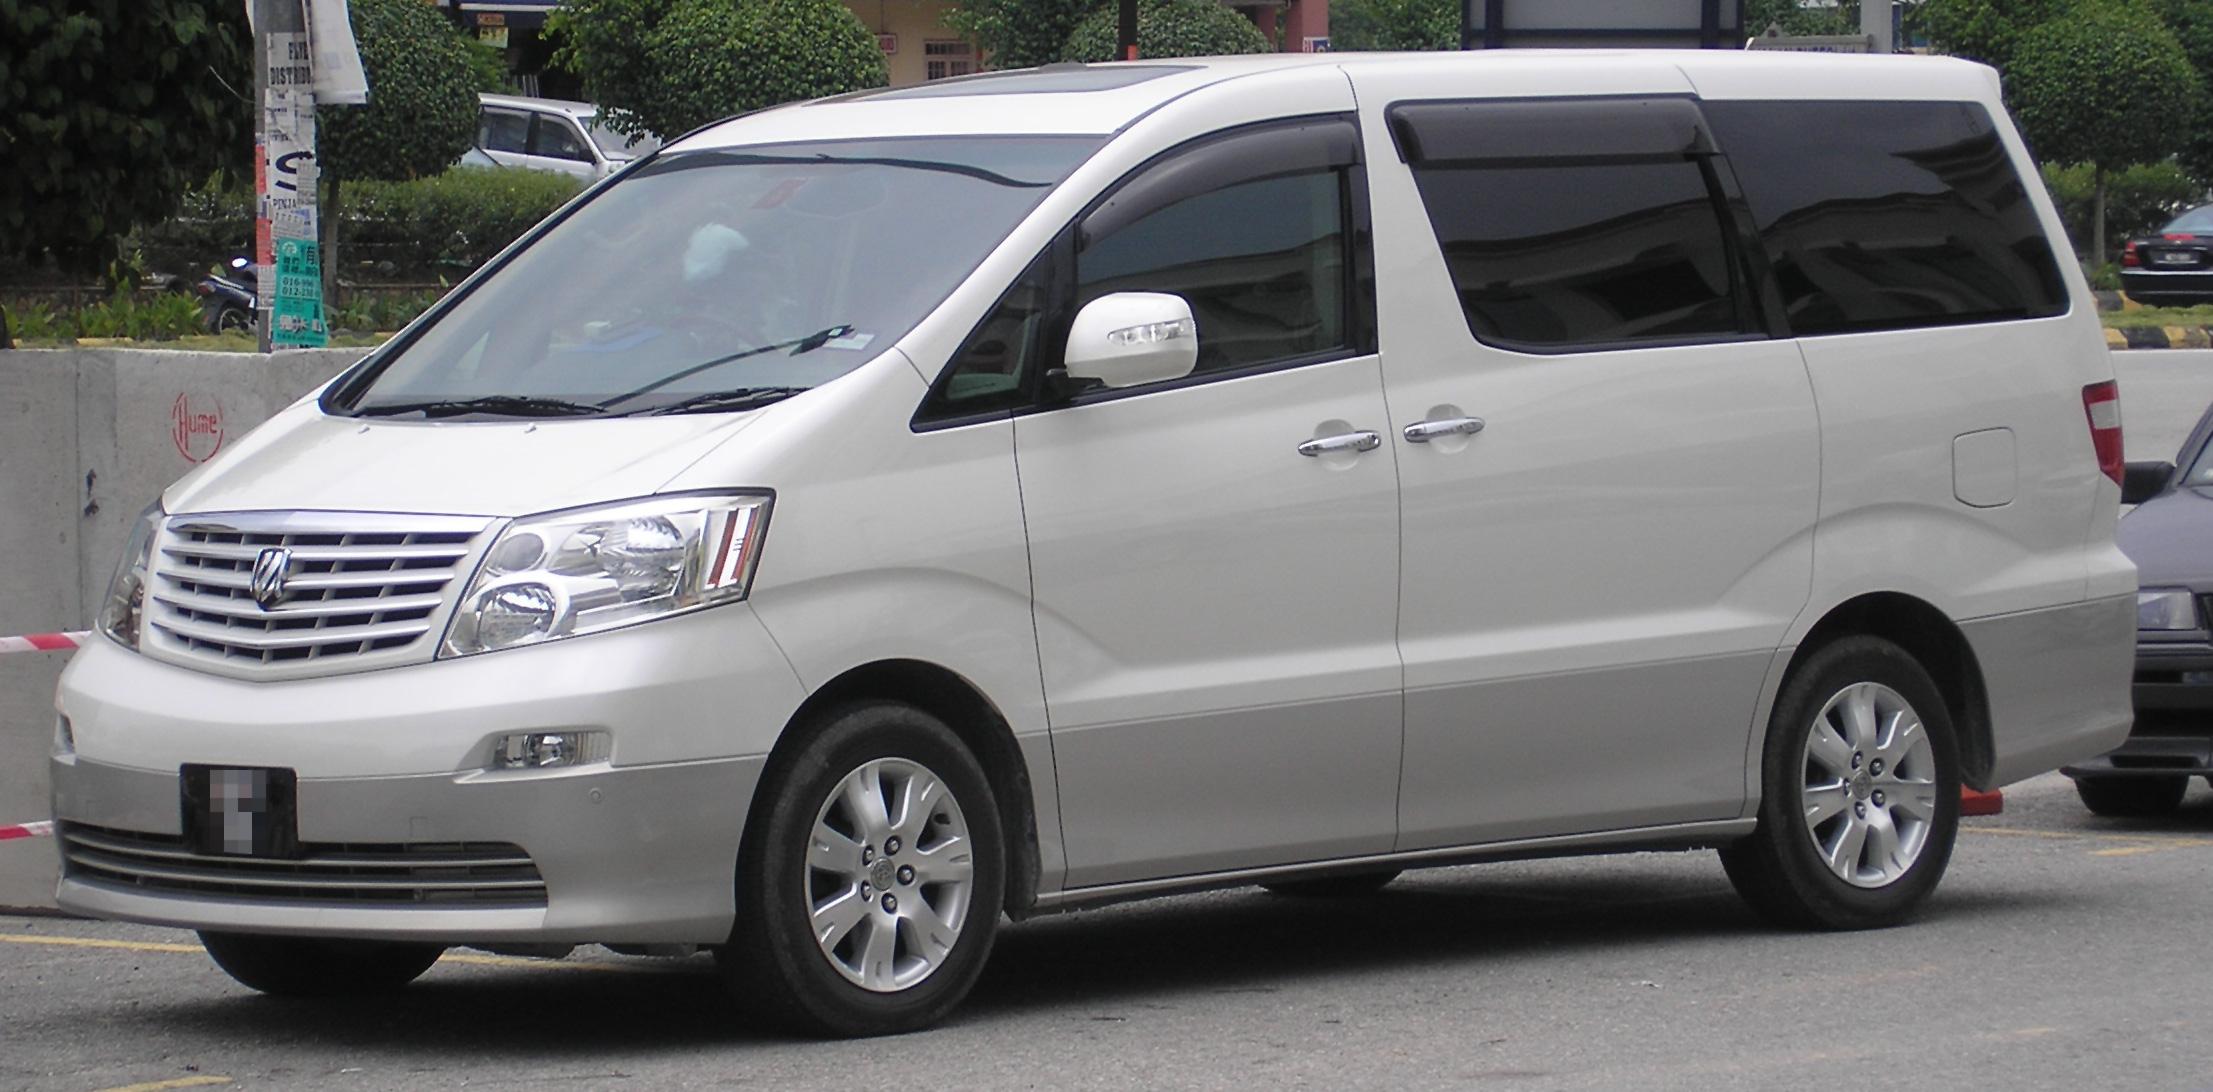 Toyota Alphard I 2002 - 2005 Minivan #1